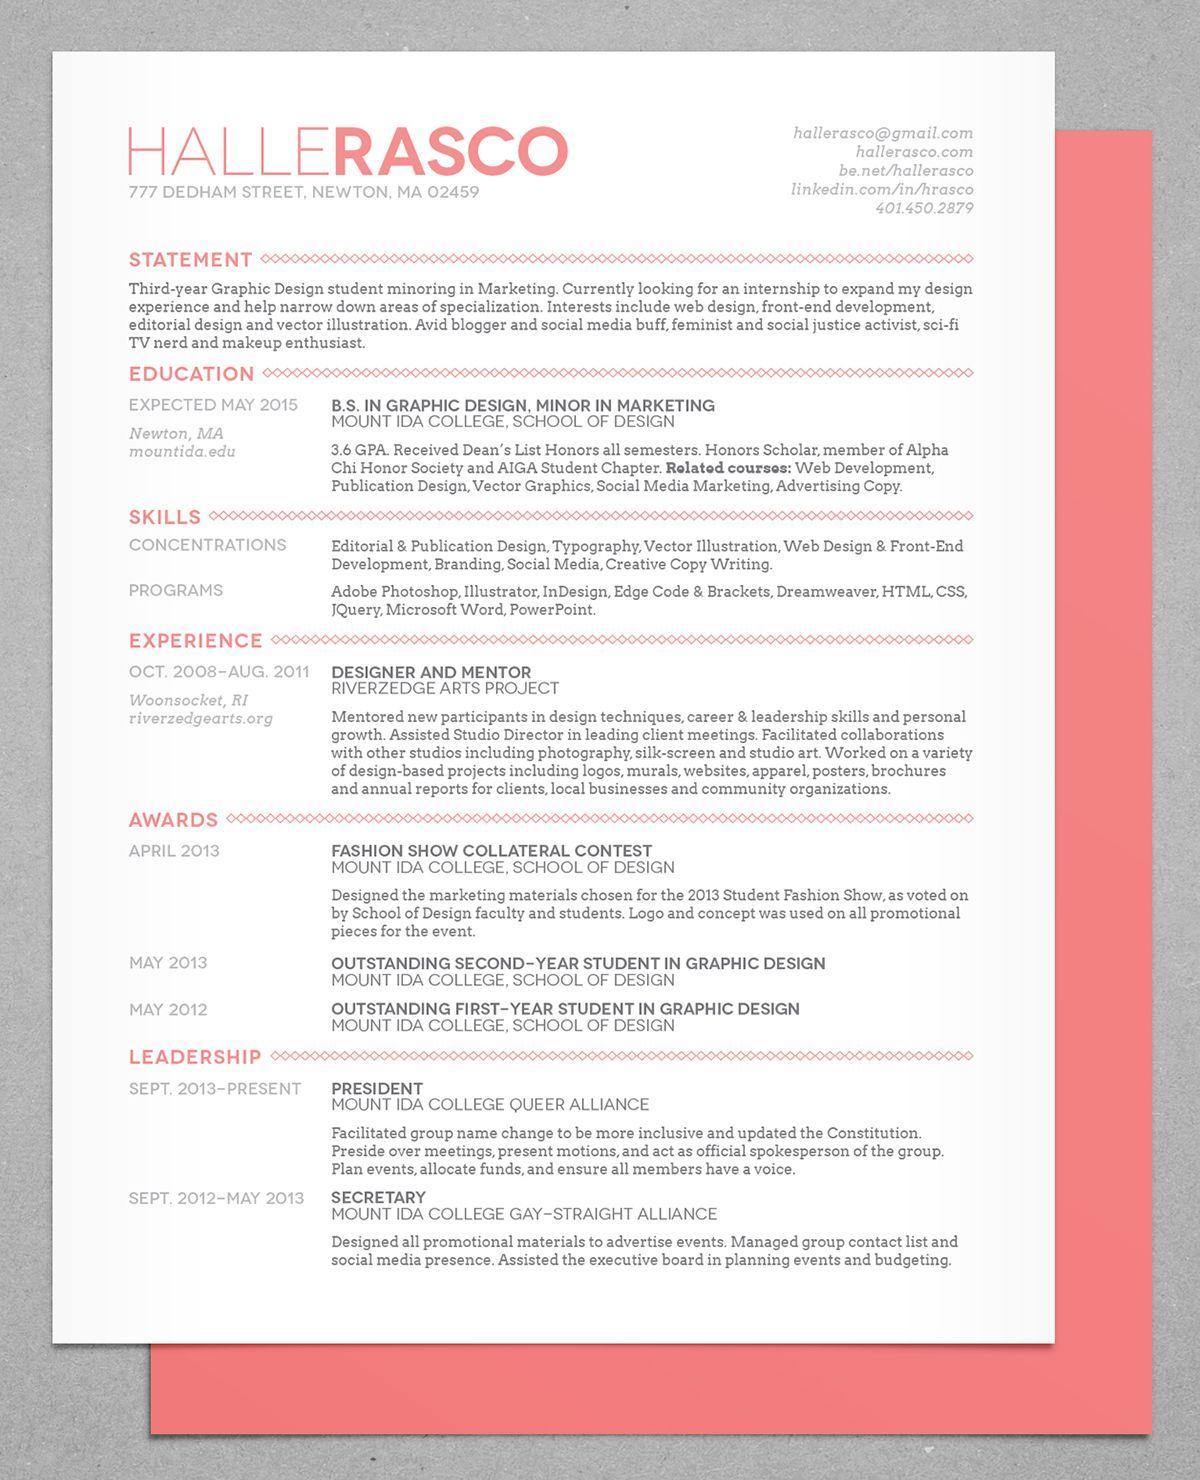 Halle Rasco Personal Branding 2013/14 on Behance in 2020